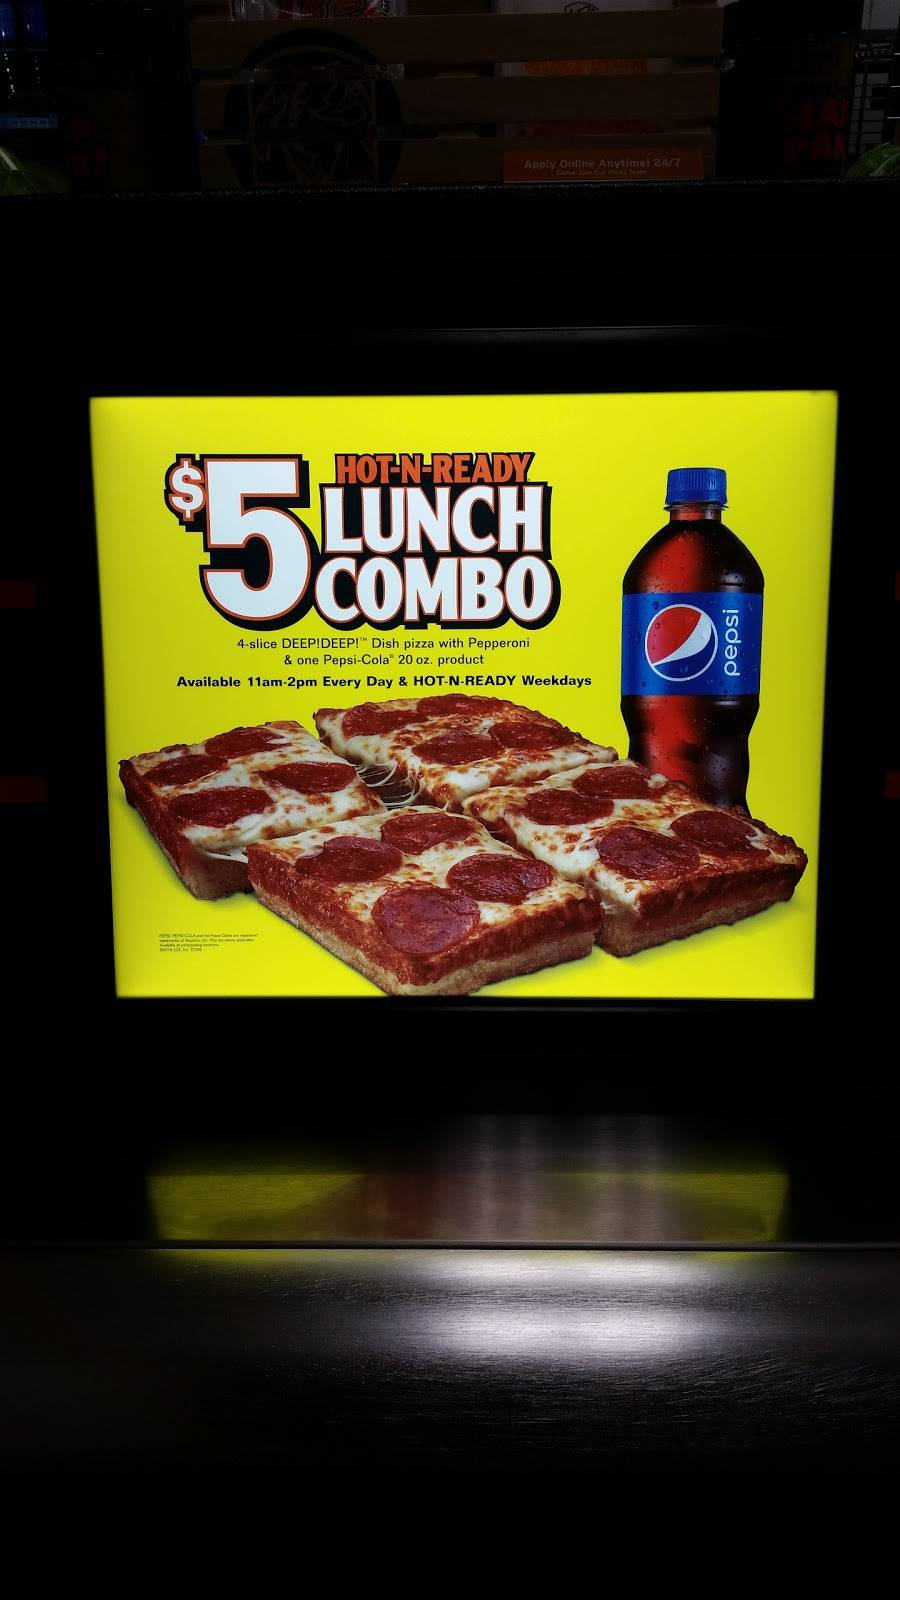 Little Caesars Pizza | restaurant | 2130 Redstone Rd SW, Huntsville, AL 35803, USA | 2568812555 OR +1 256-881-2555